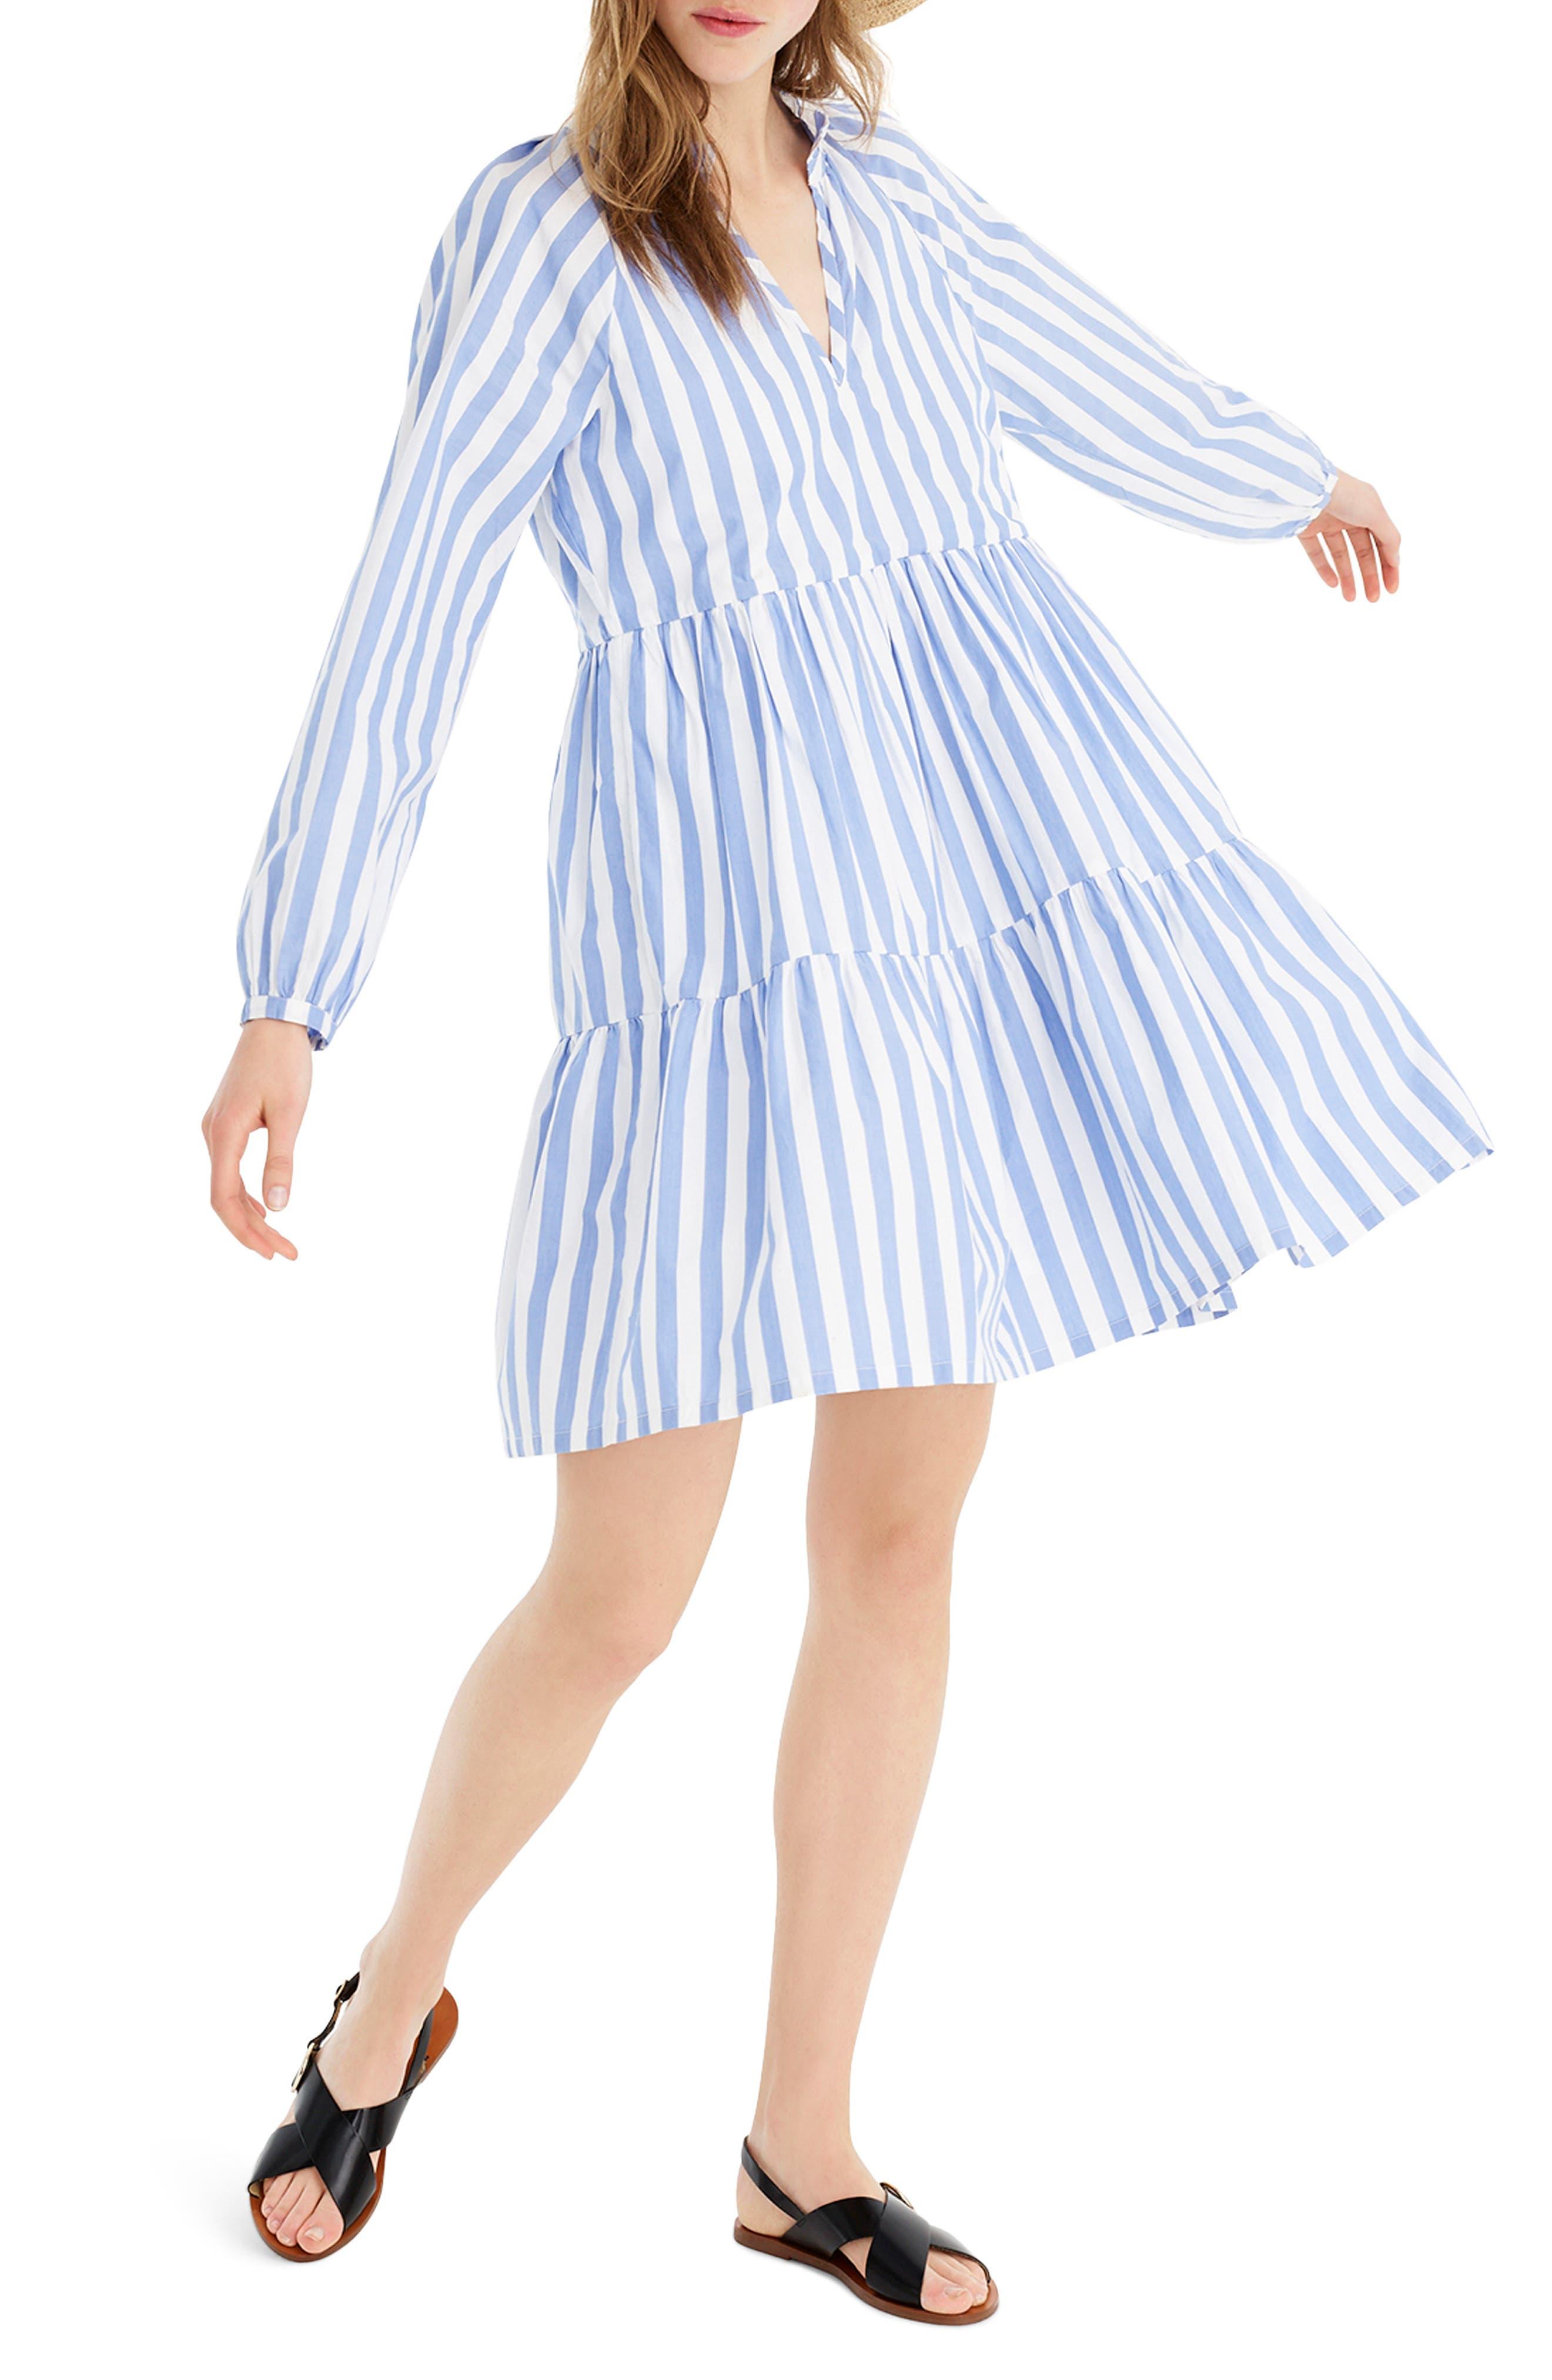 J.crew Tiered Popover Dress In Striped Poplin, Blue